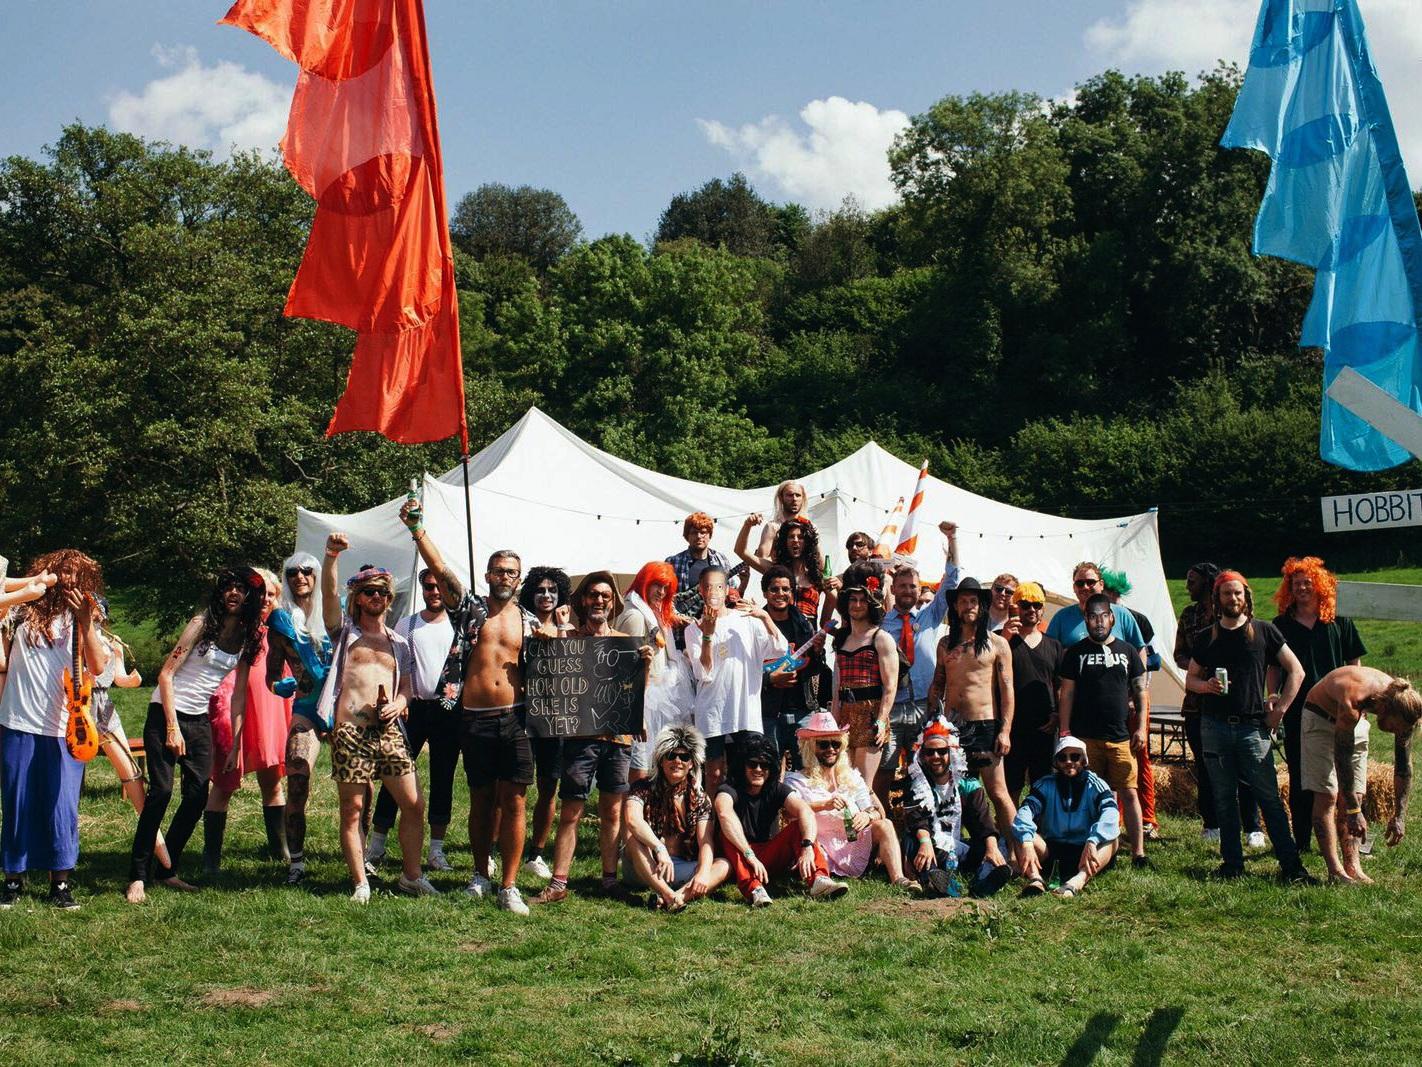 fiesta-fields-stag-do-festival-1.jpg